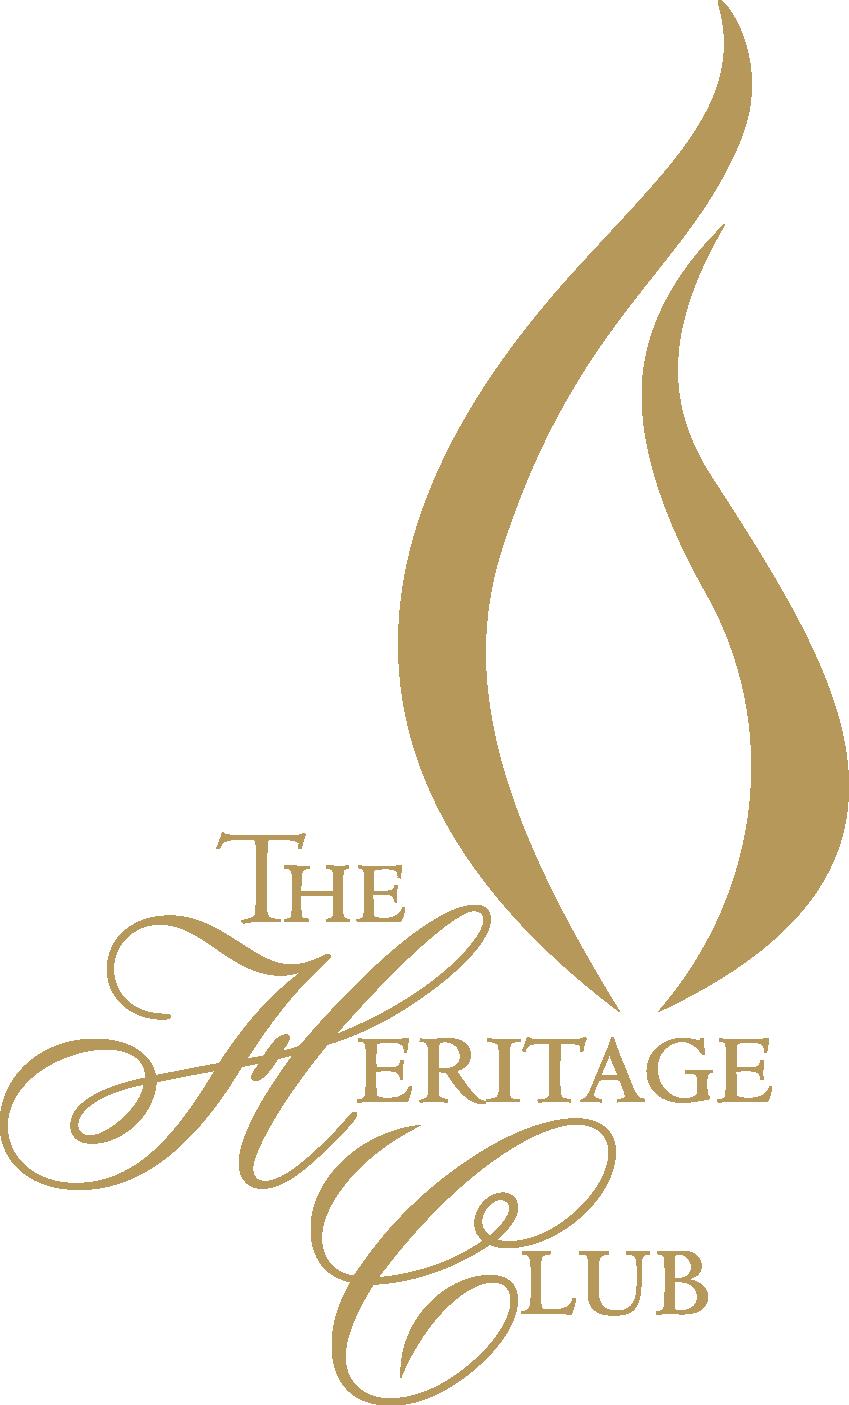 ._Heritage Club_CLR